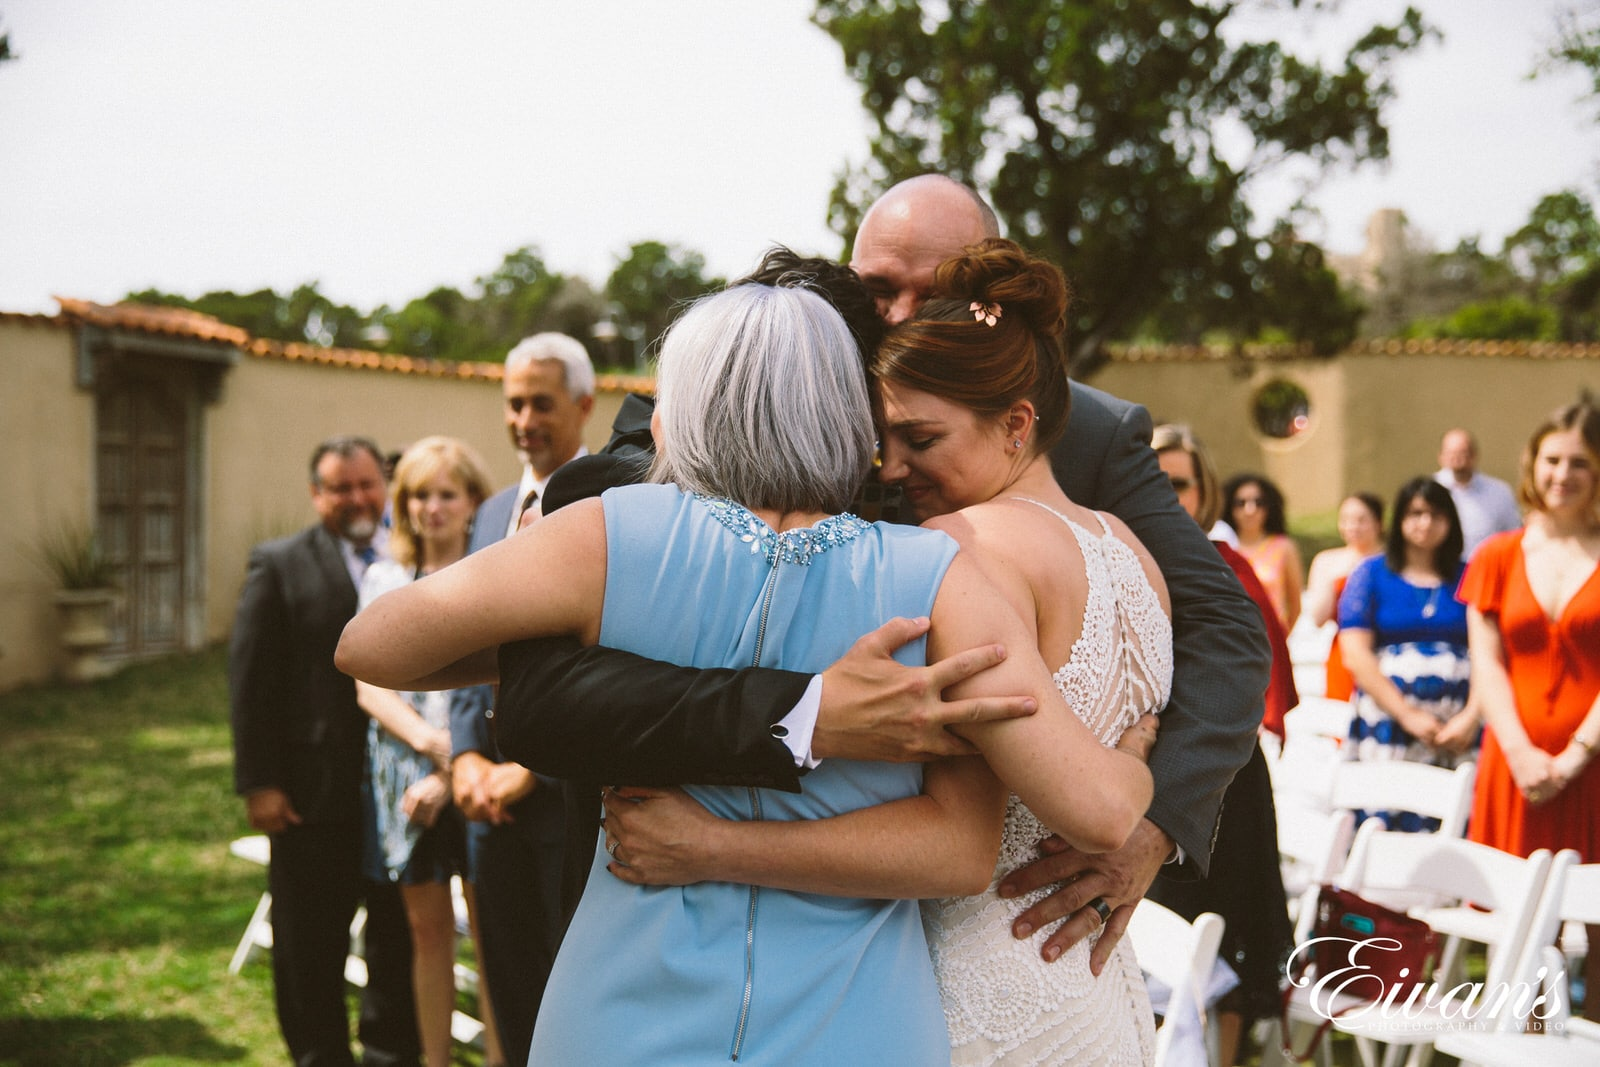 woman in white sleeveless dress hugging woman in black dress